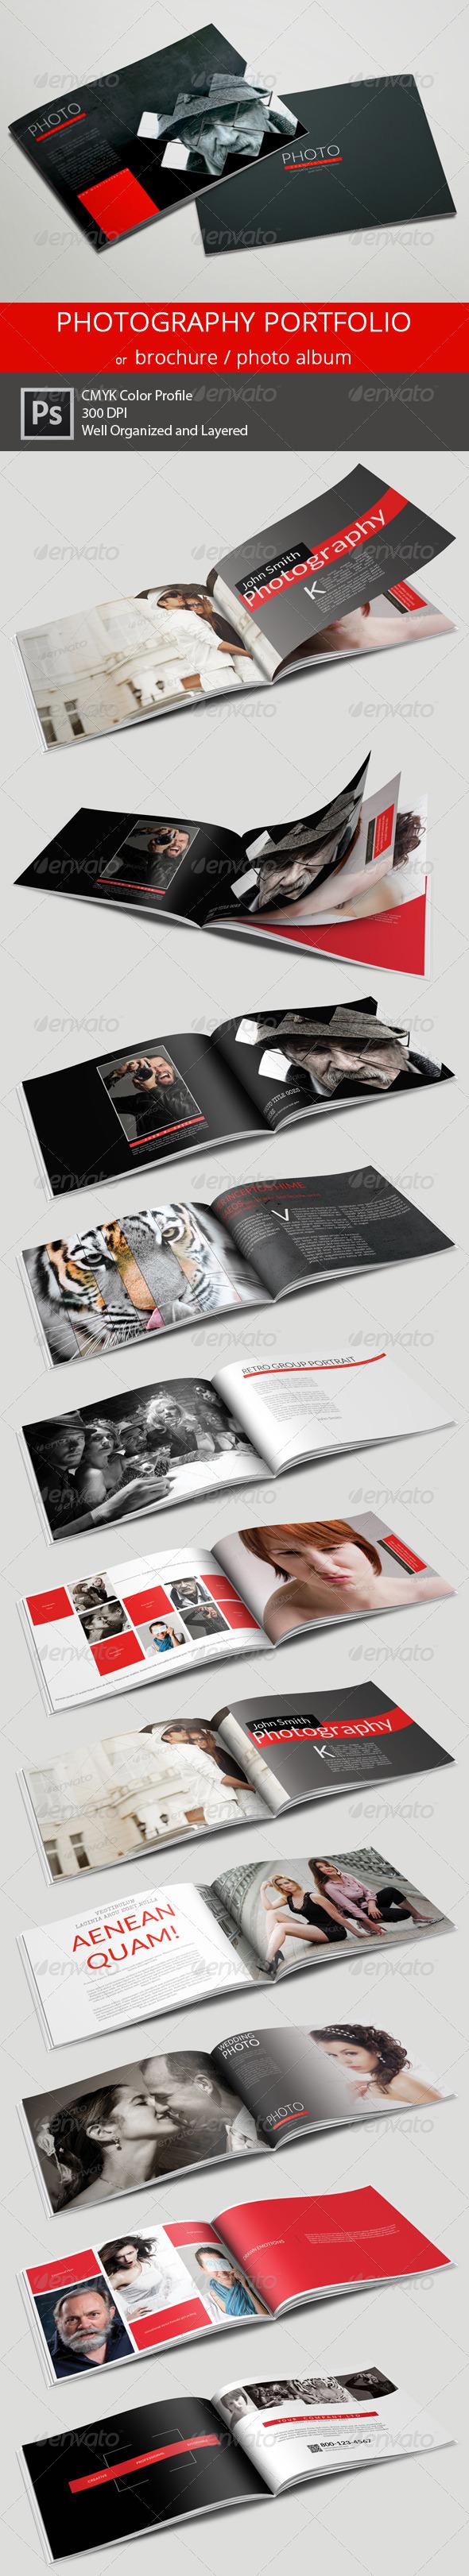 GraphicRiver 20 Pages Photography Portfolio or Photo Album 6362564